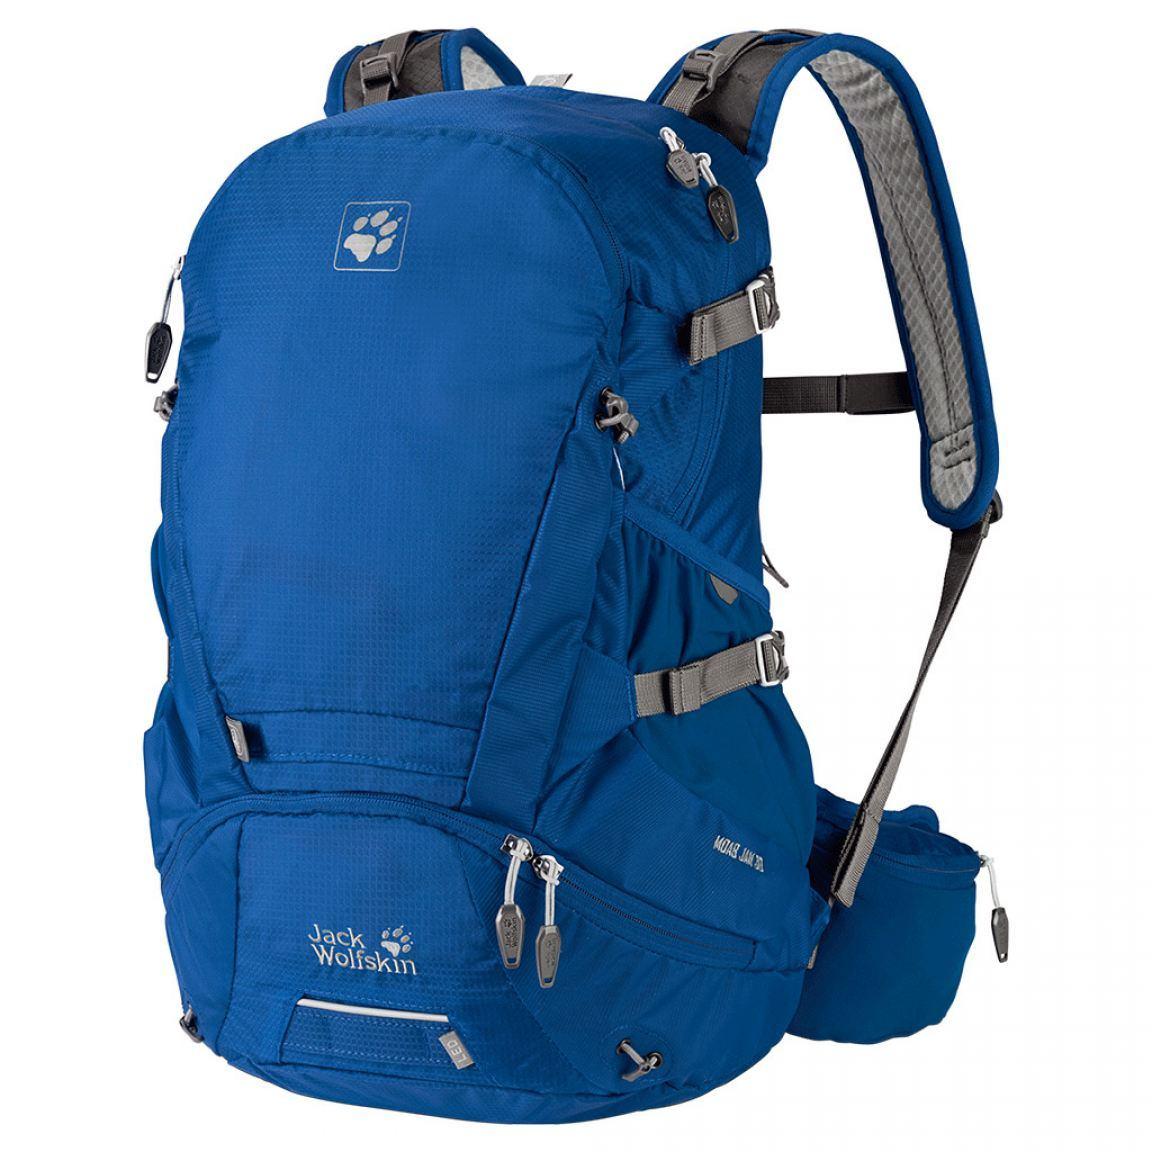 Rucksack Jack Wolfskin Daypack Moab Jam 30 classic blue ...